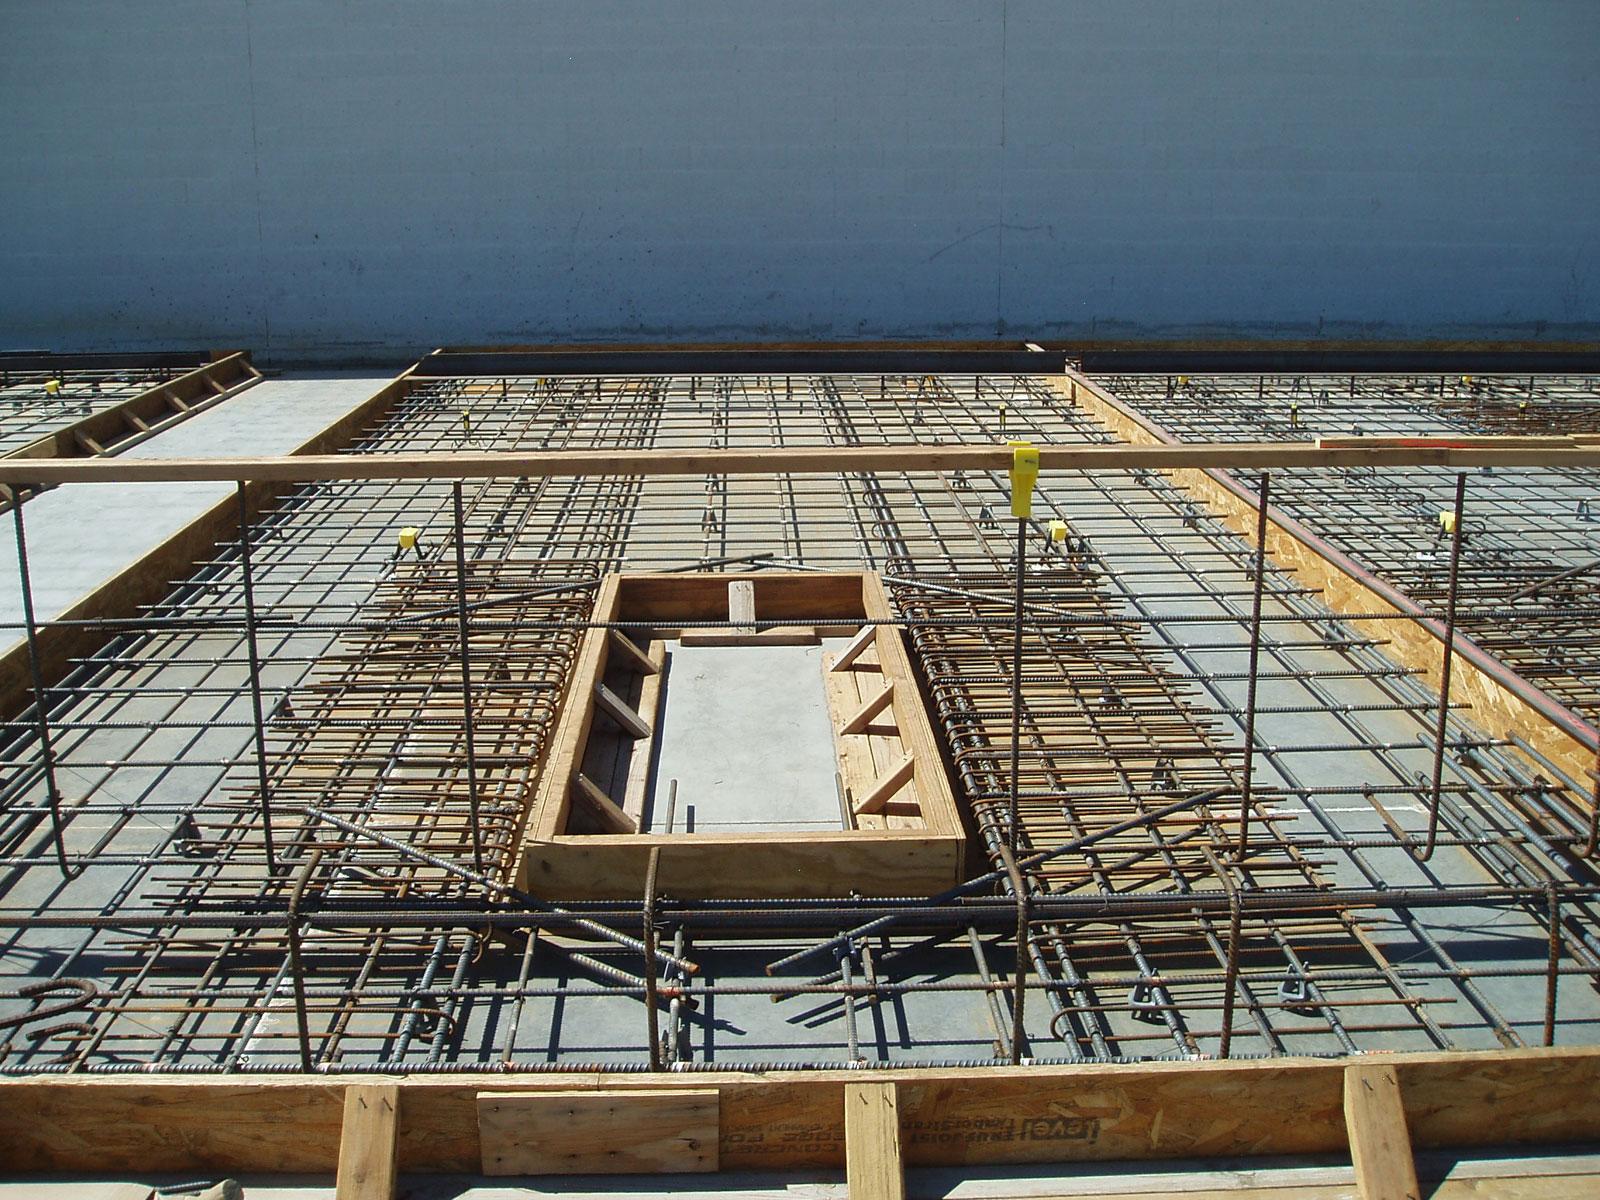 Industrial Concrete - P3190014